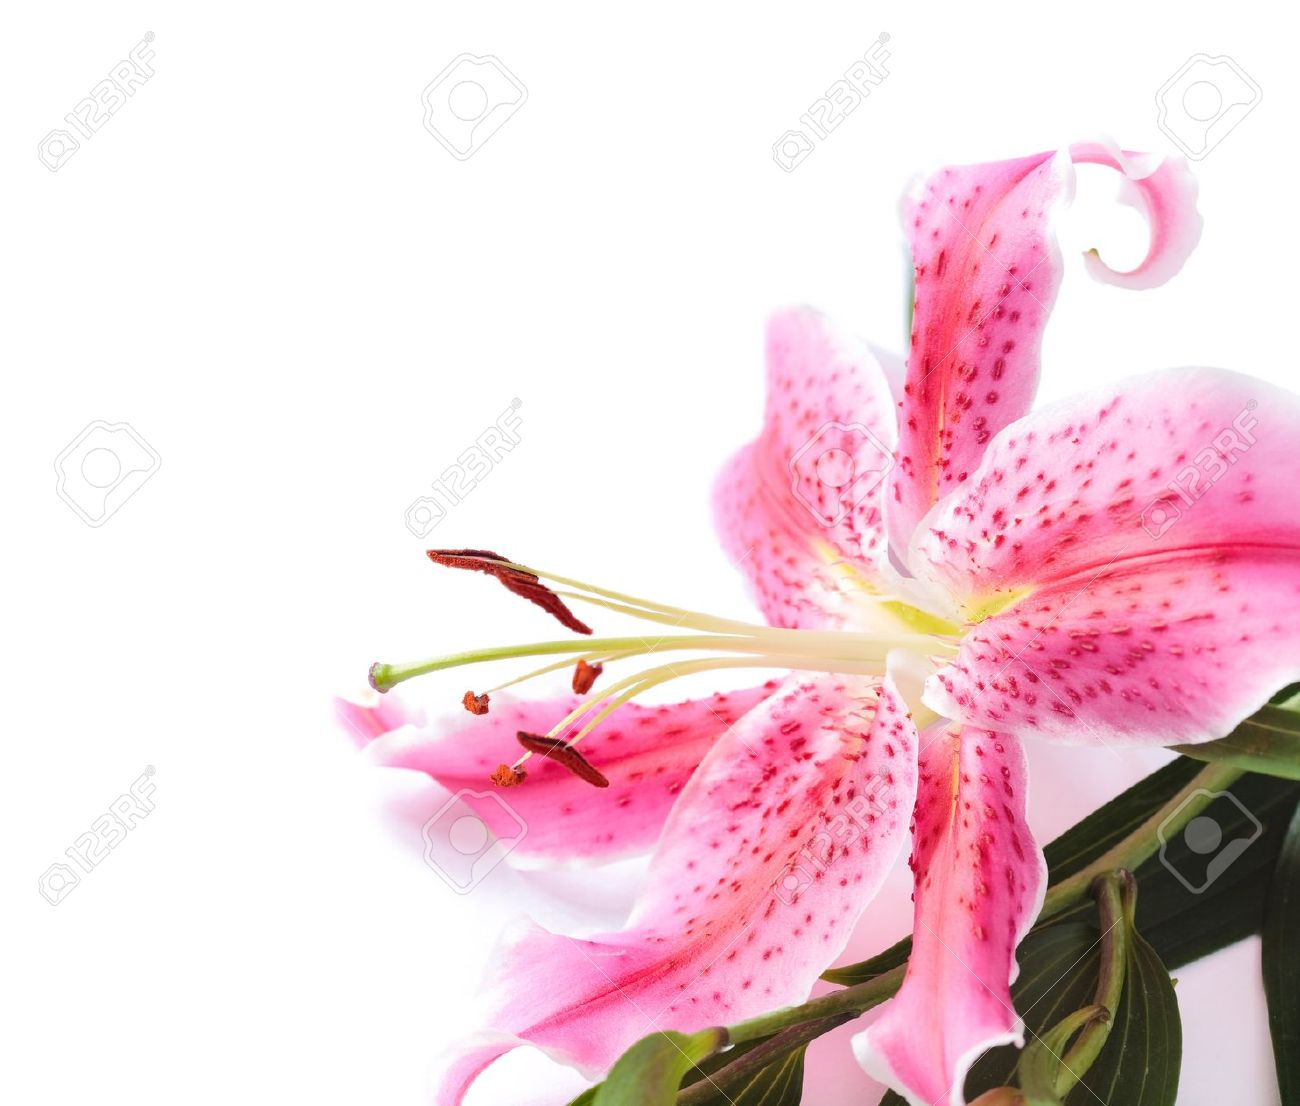 Pink stargazer lily flower in the corner of the frame against pink stargazer lily flower in the corner of the frame against a white background has a mightylinksfo